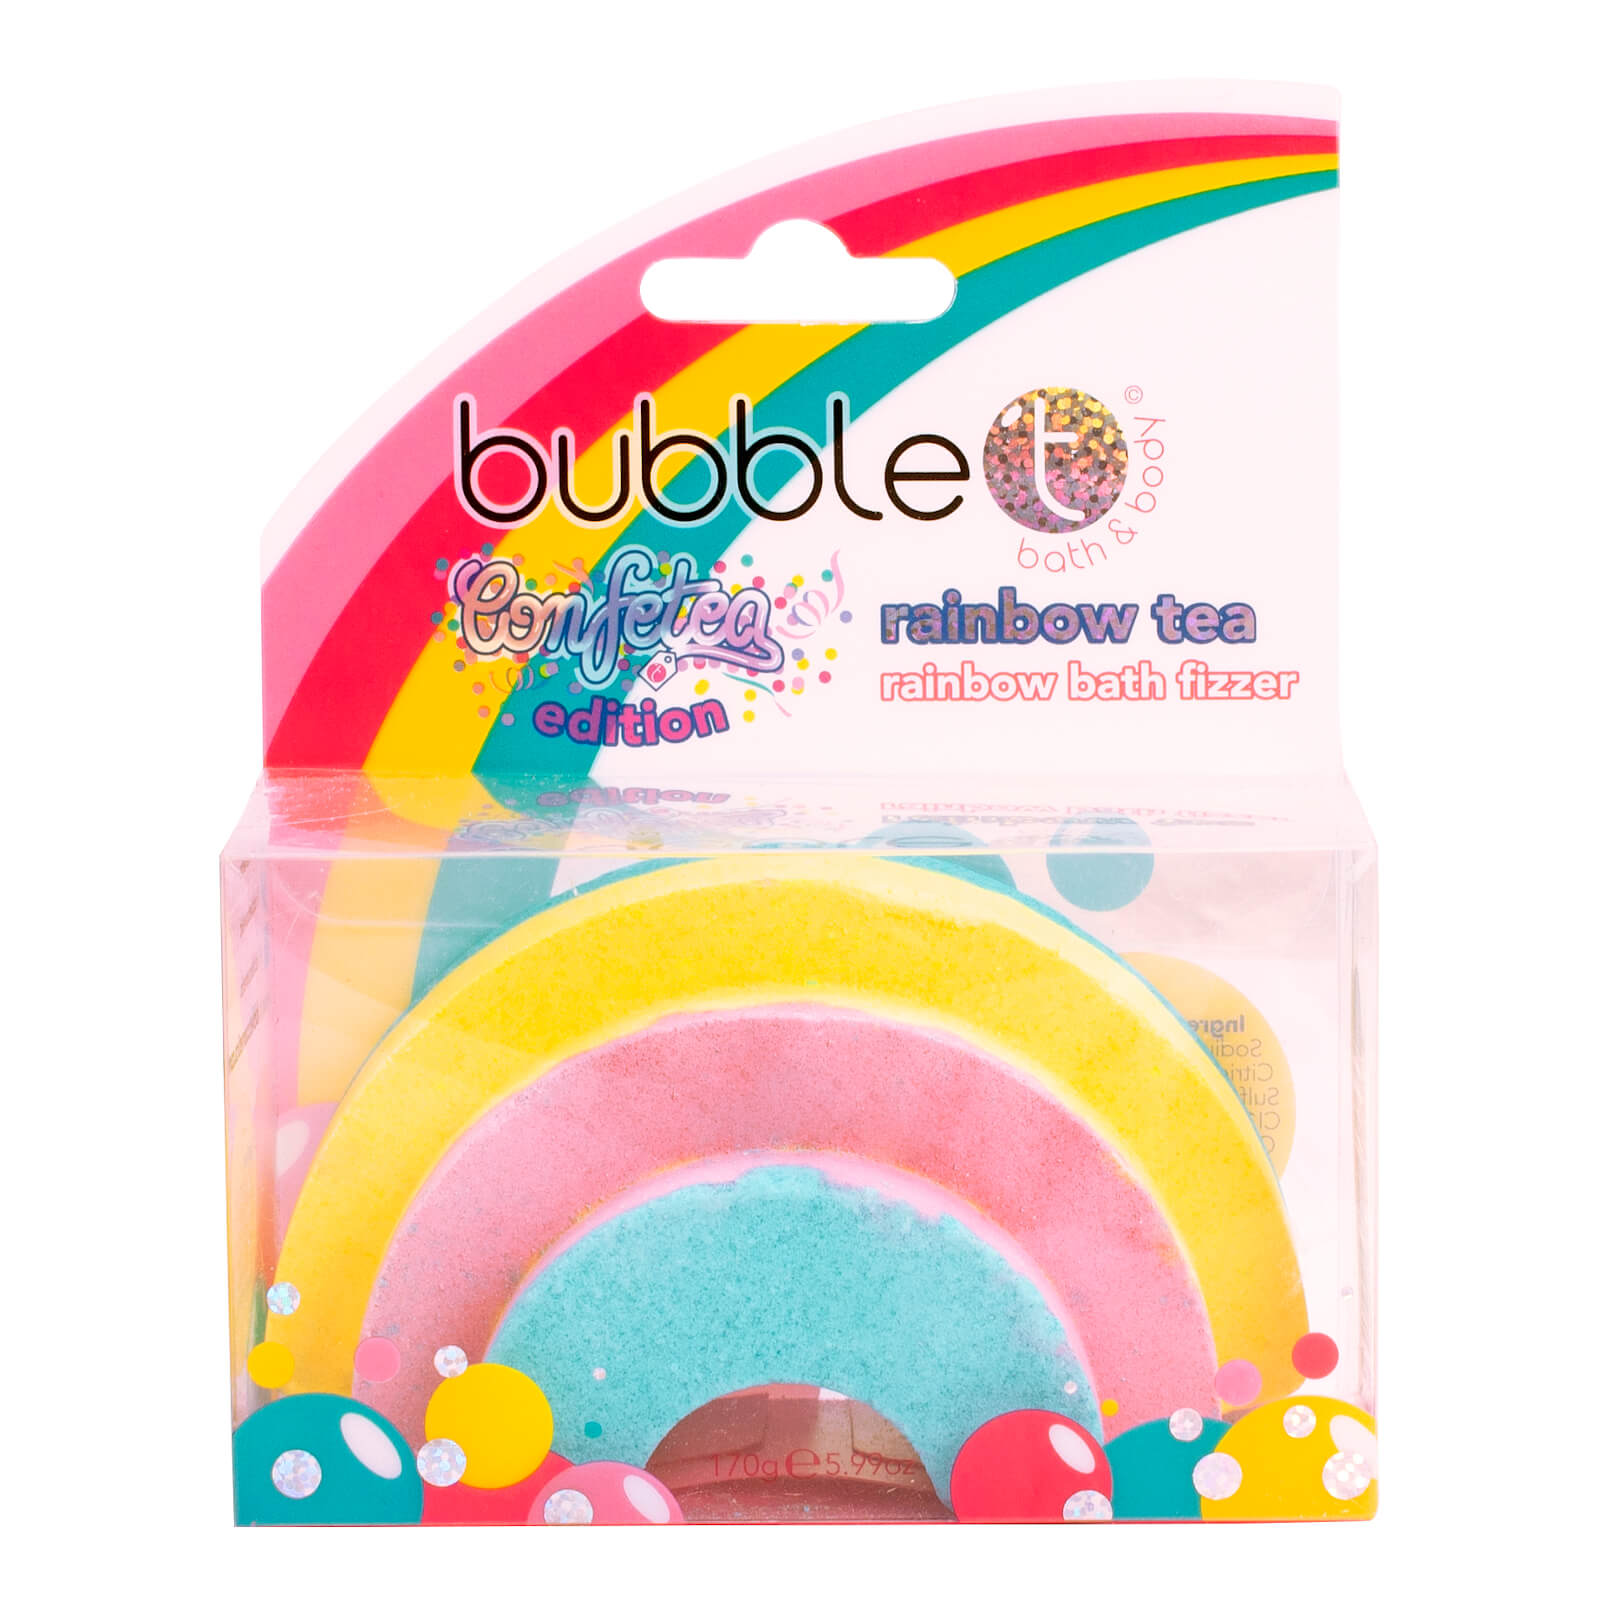 Bomba de baño de arcoíris de Bubble T